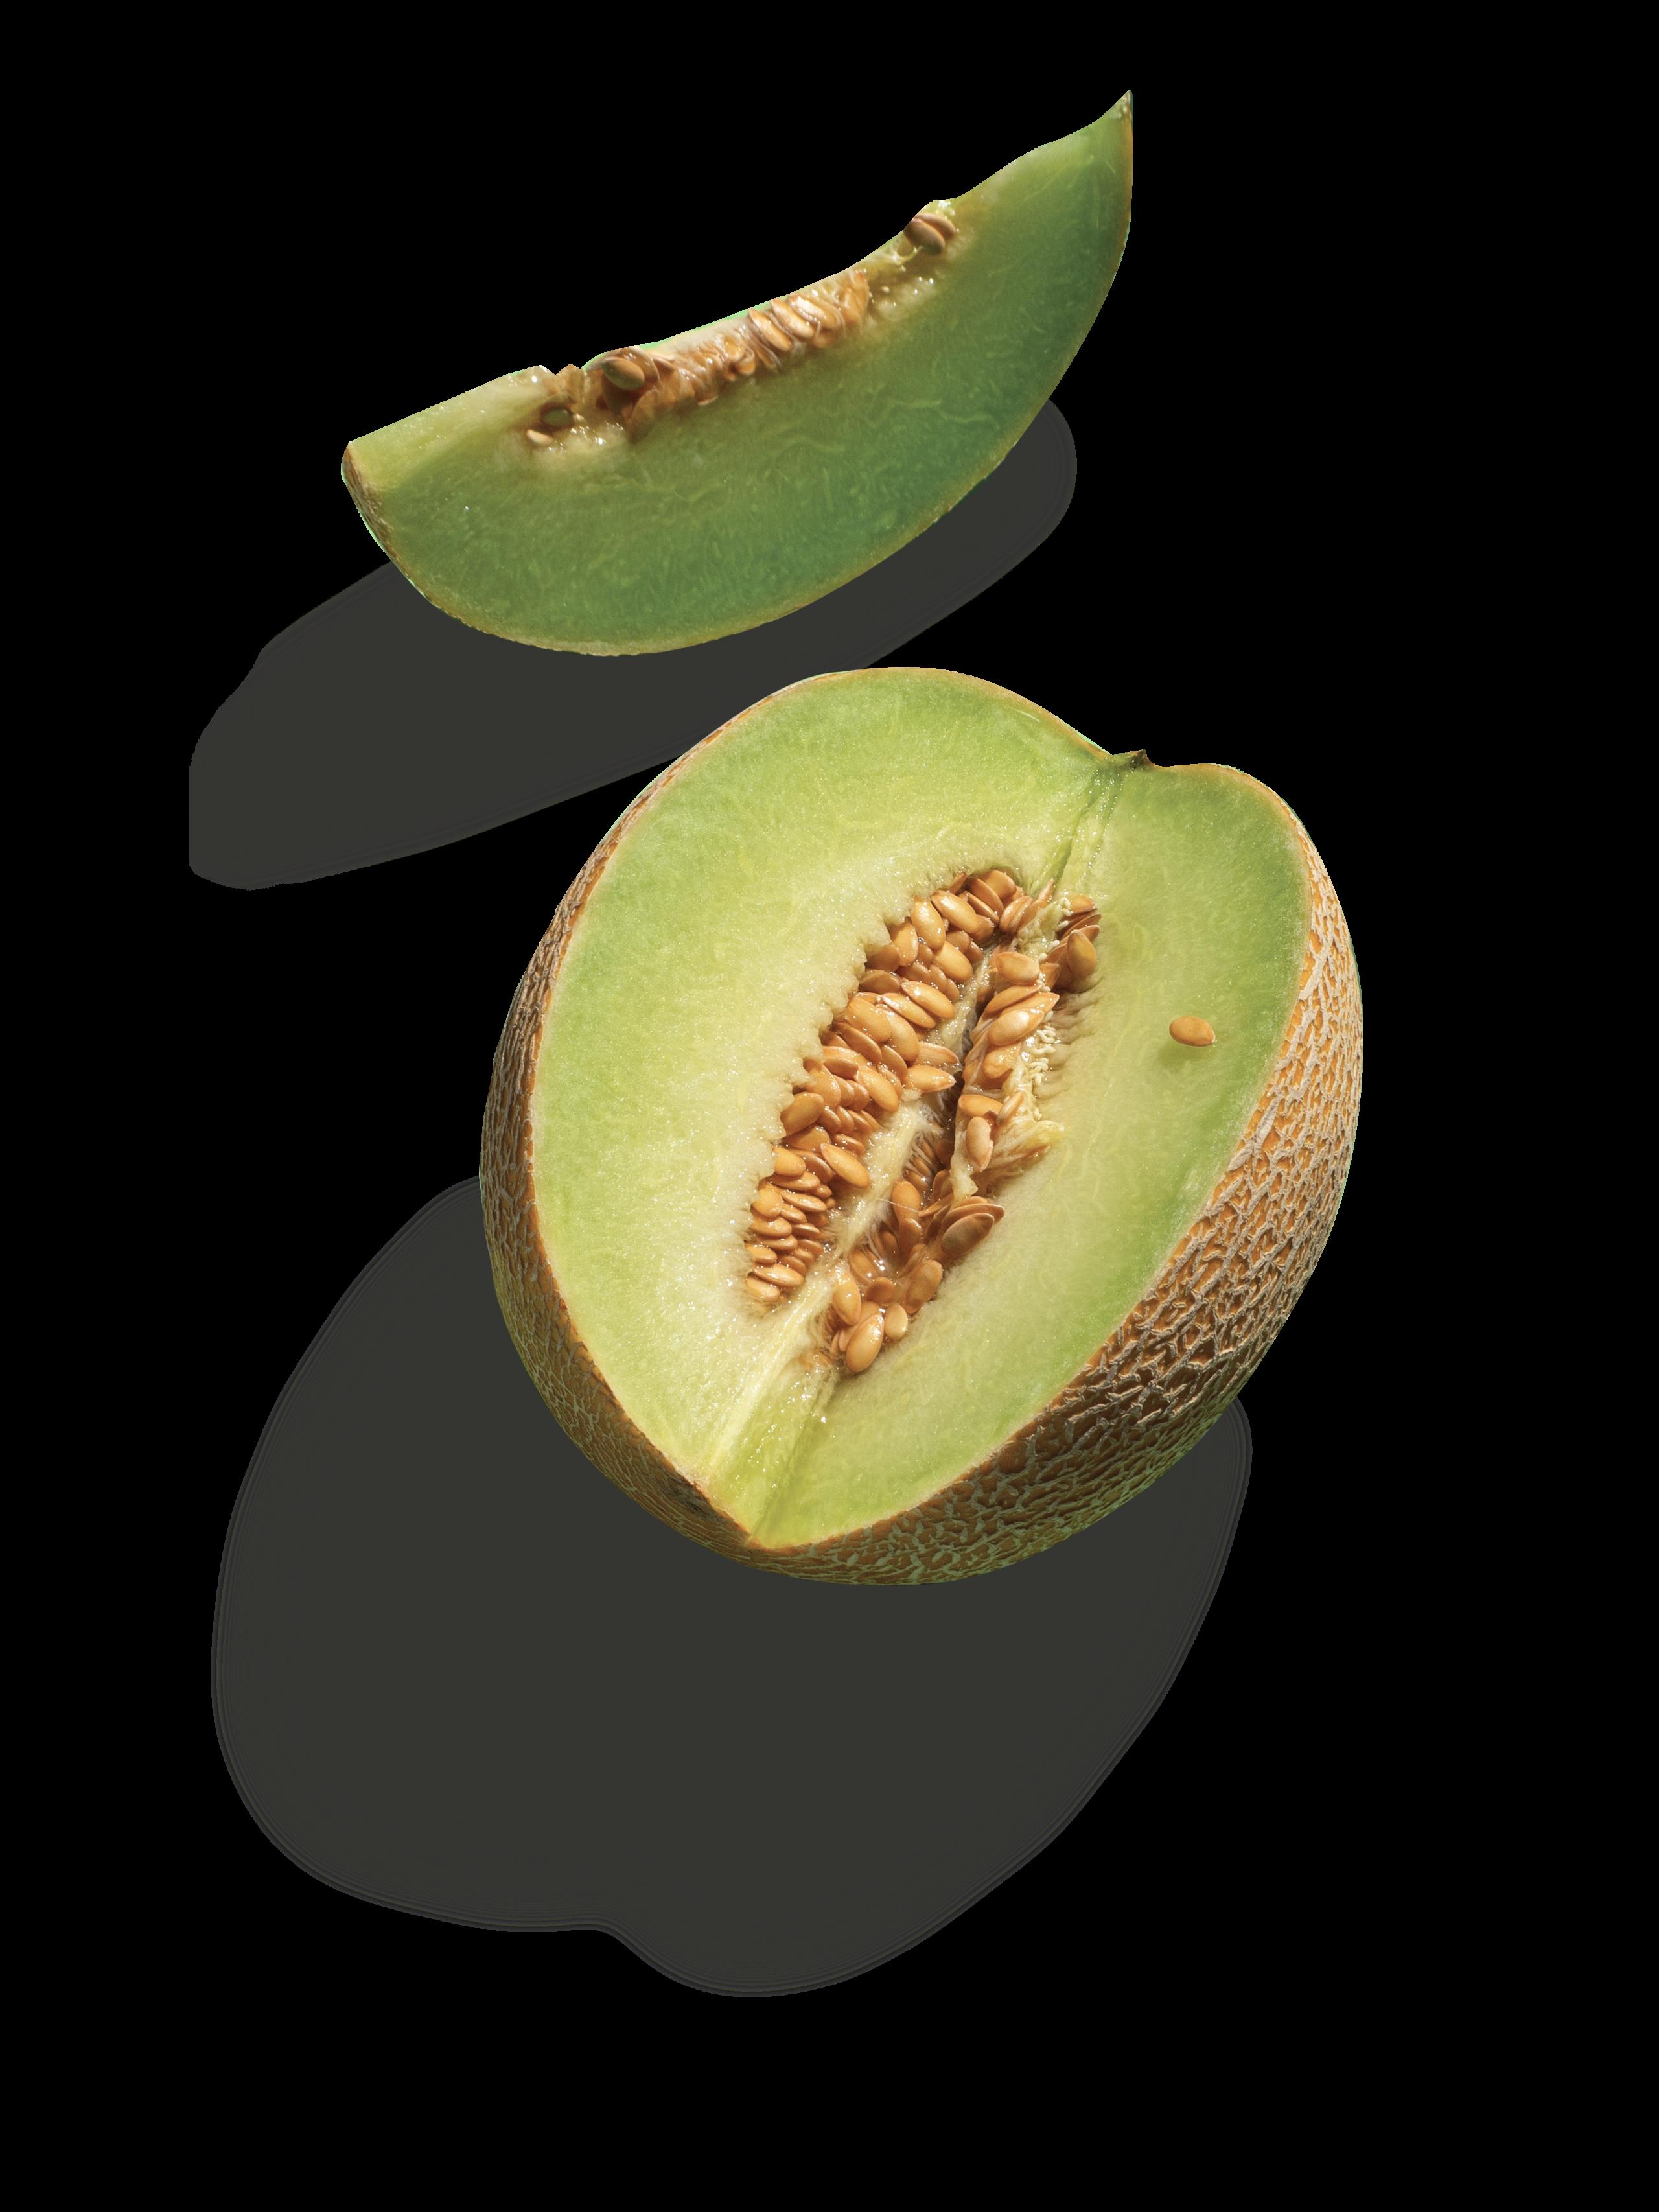 servicios-segalfs-melon-alimentacion-zaragoza